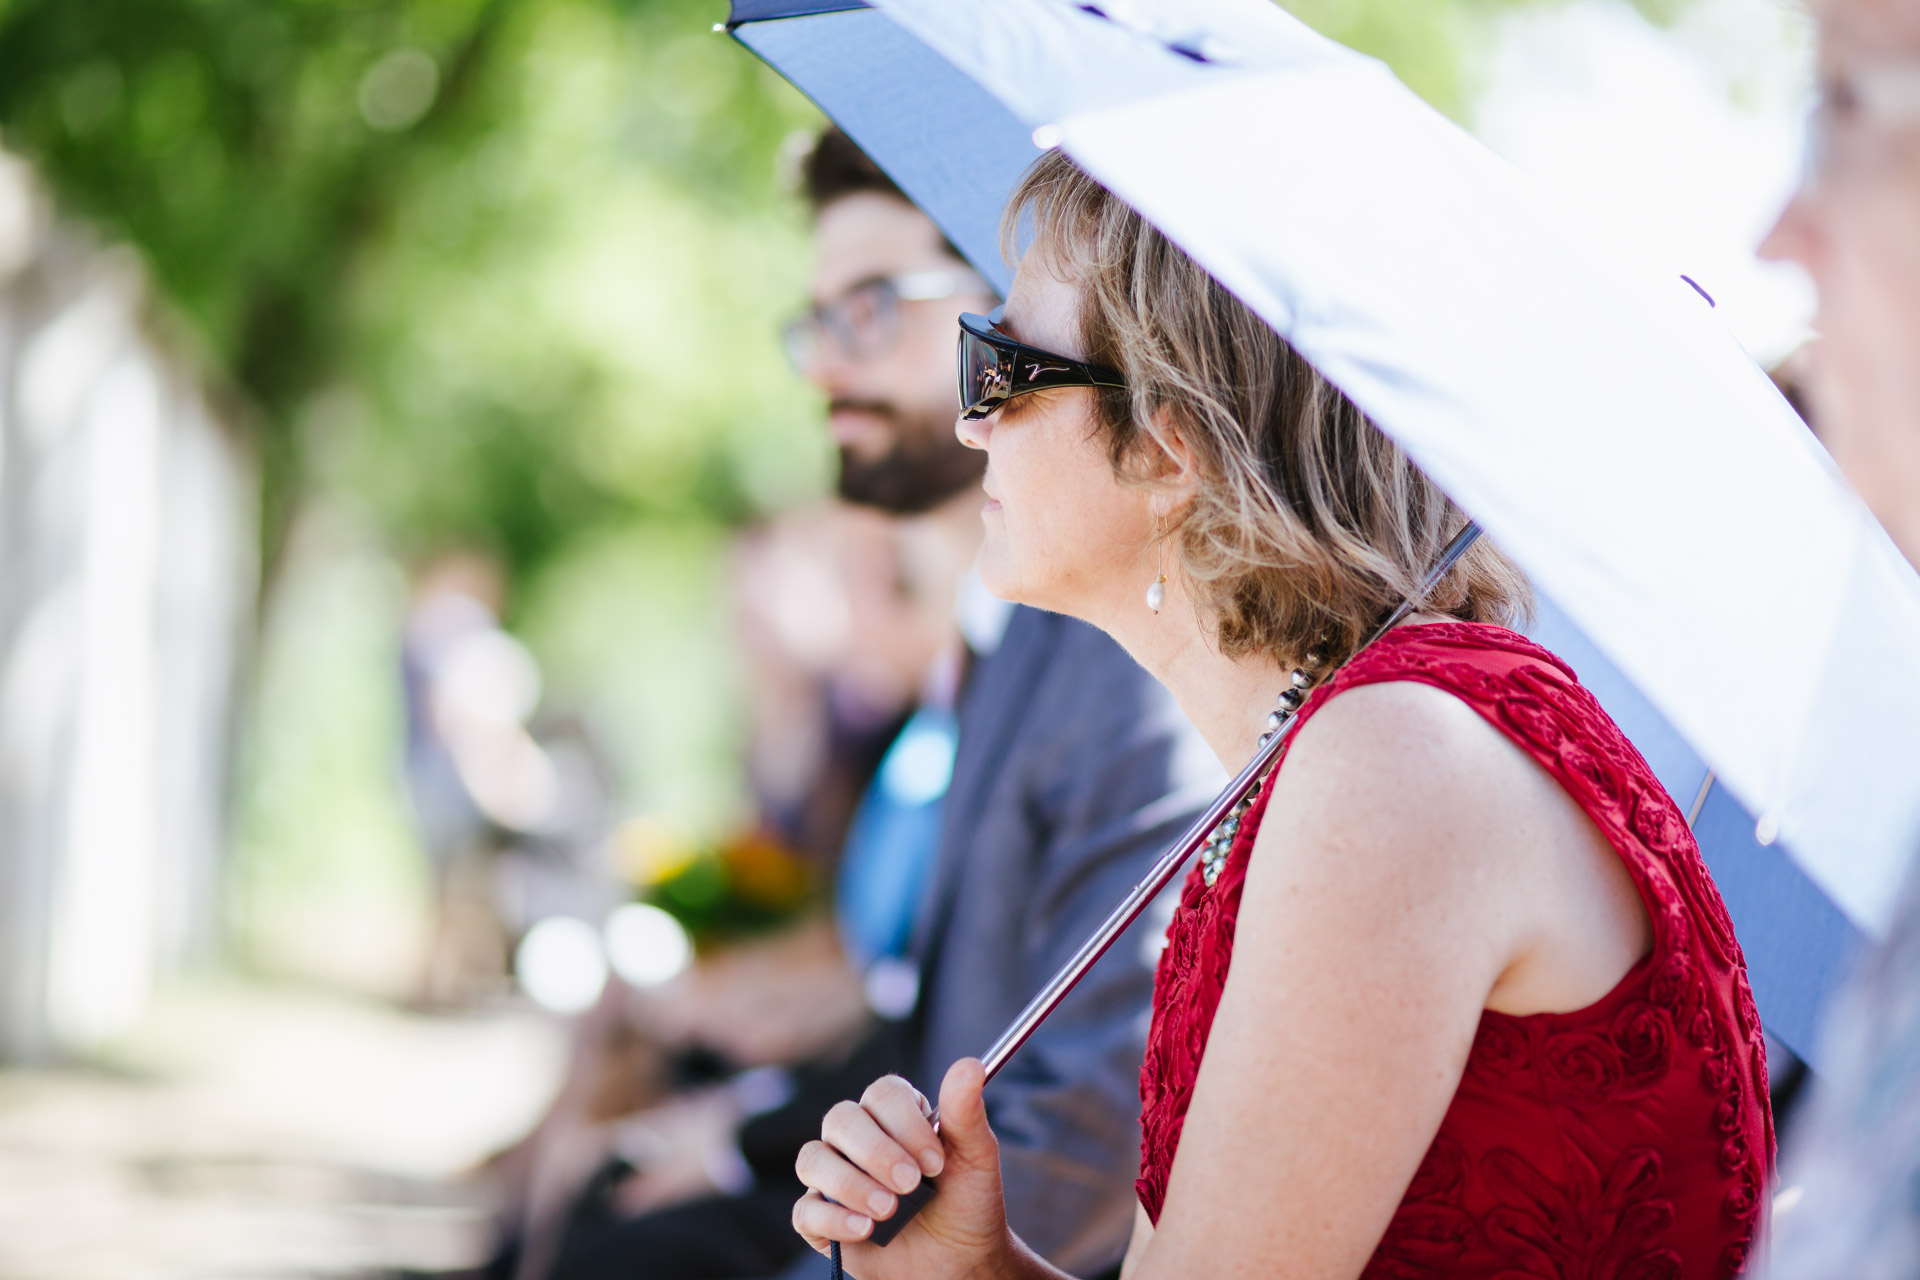 Pixelart_Hochzeitsfotografen_Loerrach_Rheinfelden_Hallwil_Schweiz_Linda-Ramon-1034